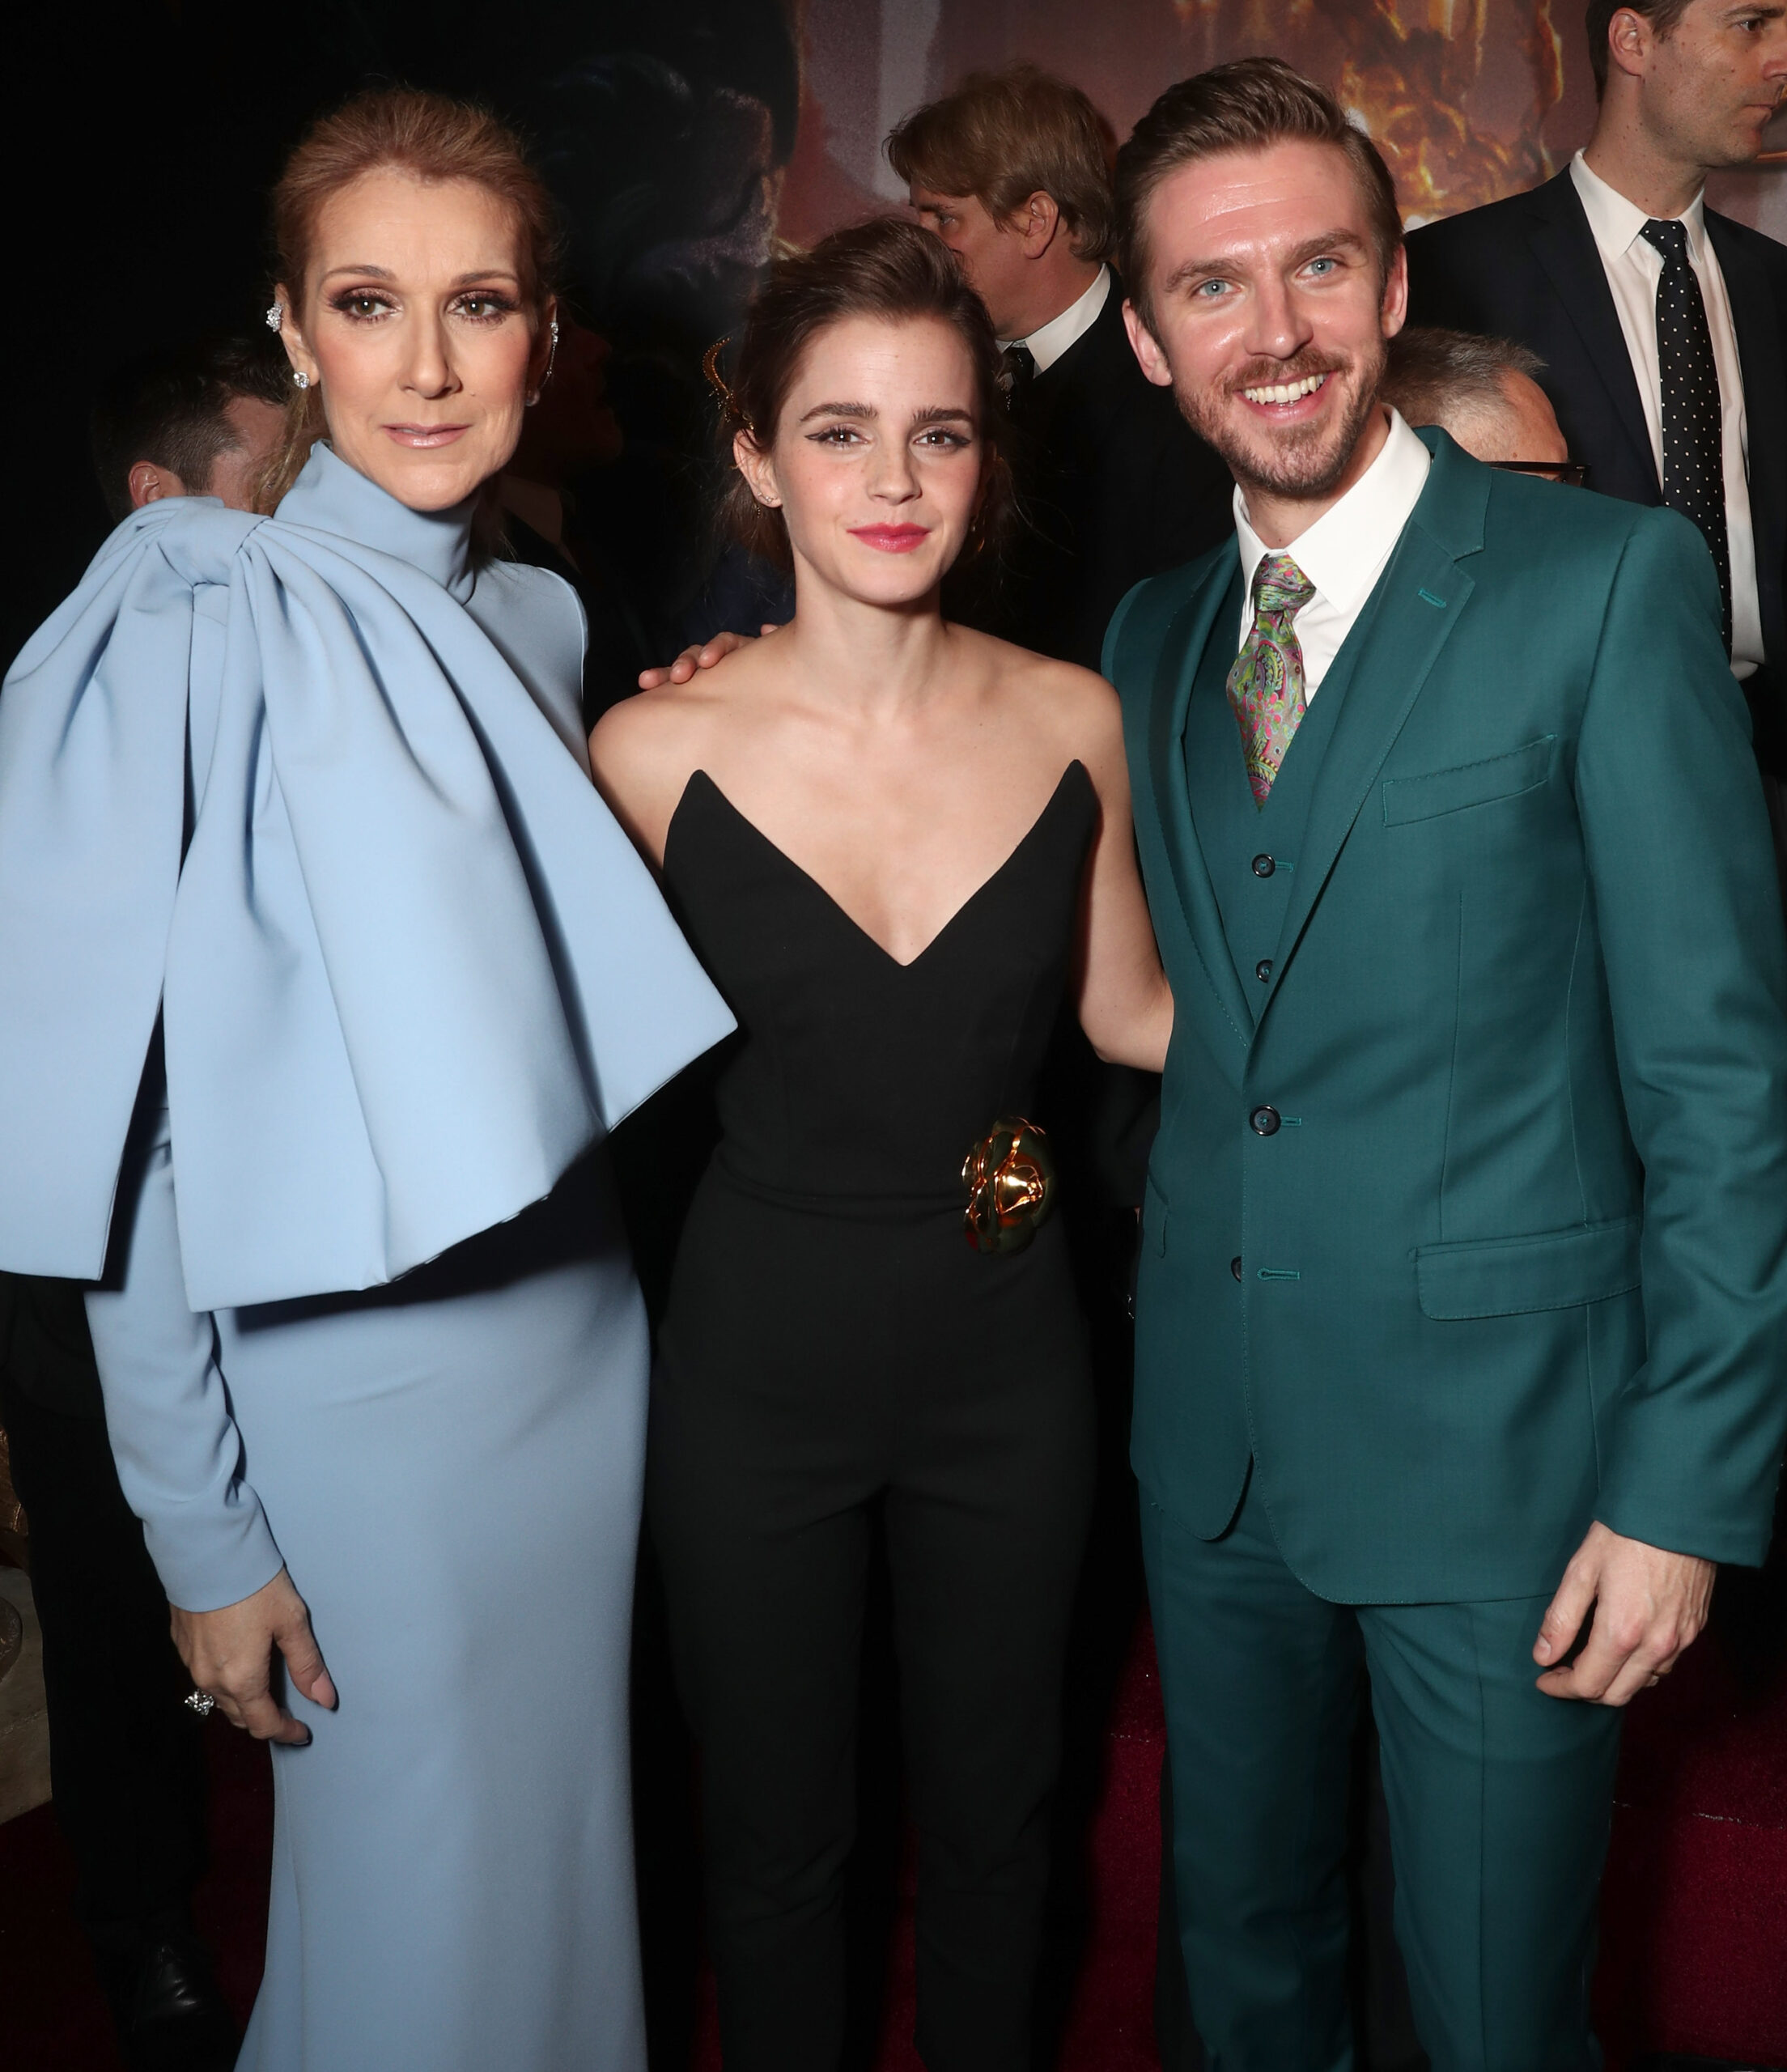 Celine Dion, Emma Watson, Dan Stevens (Photo by Todd Williamson/Getty Images)